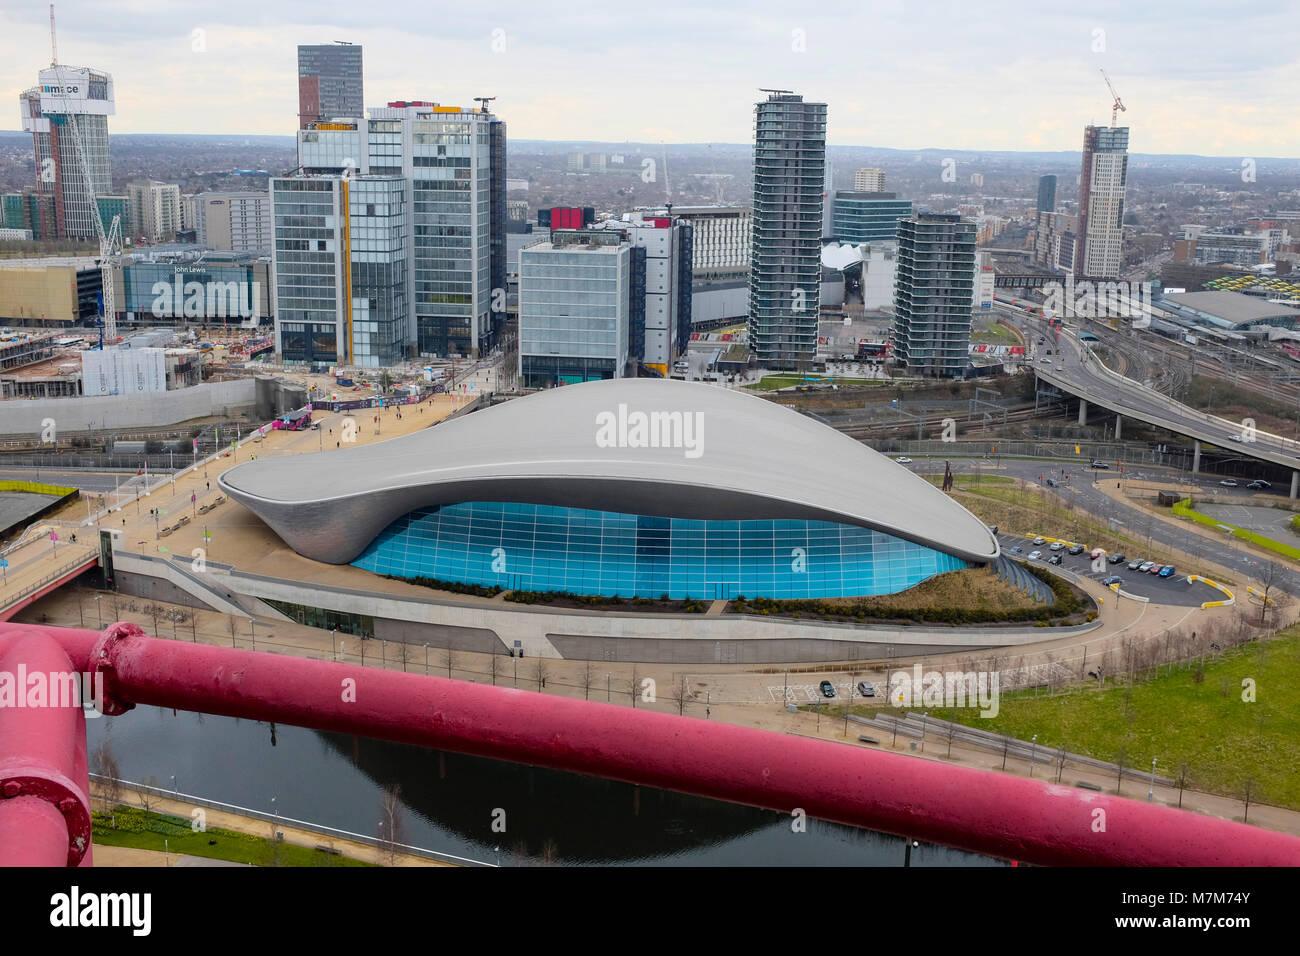 London Aquatics Centre and London Skyline, Stratford, London, UK - Stock Image